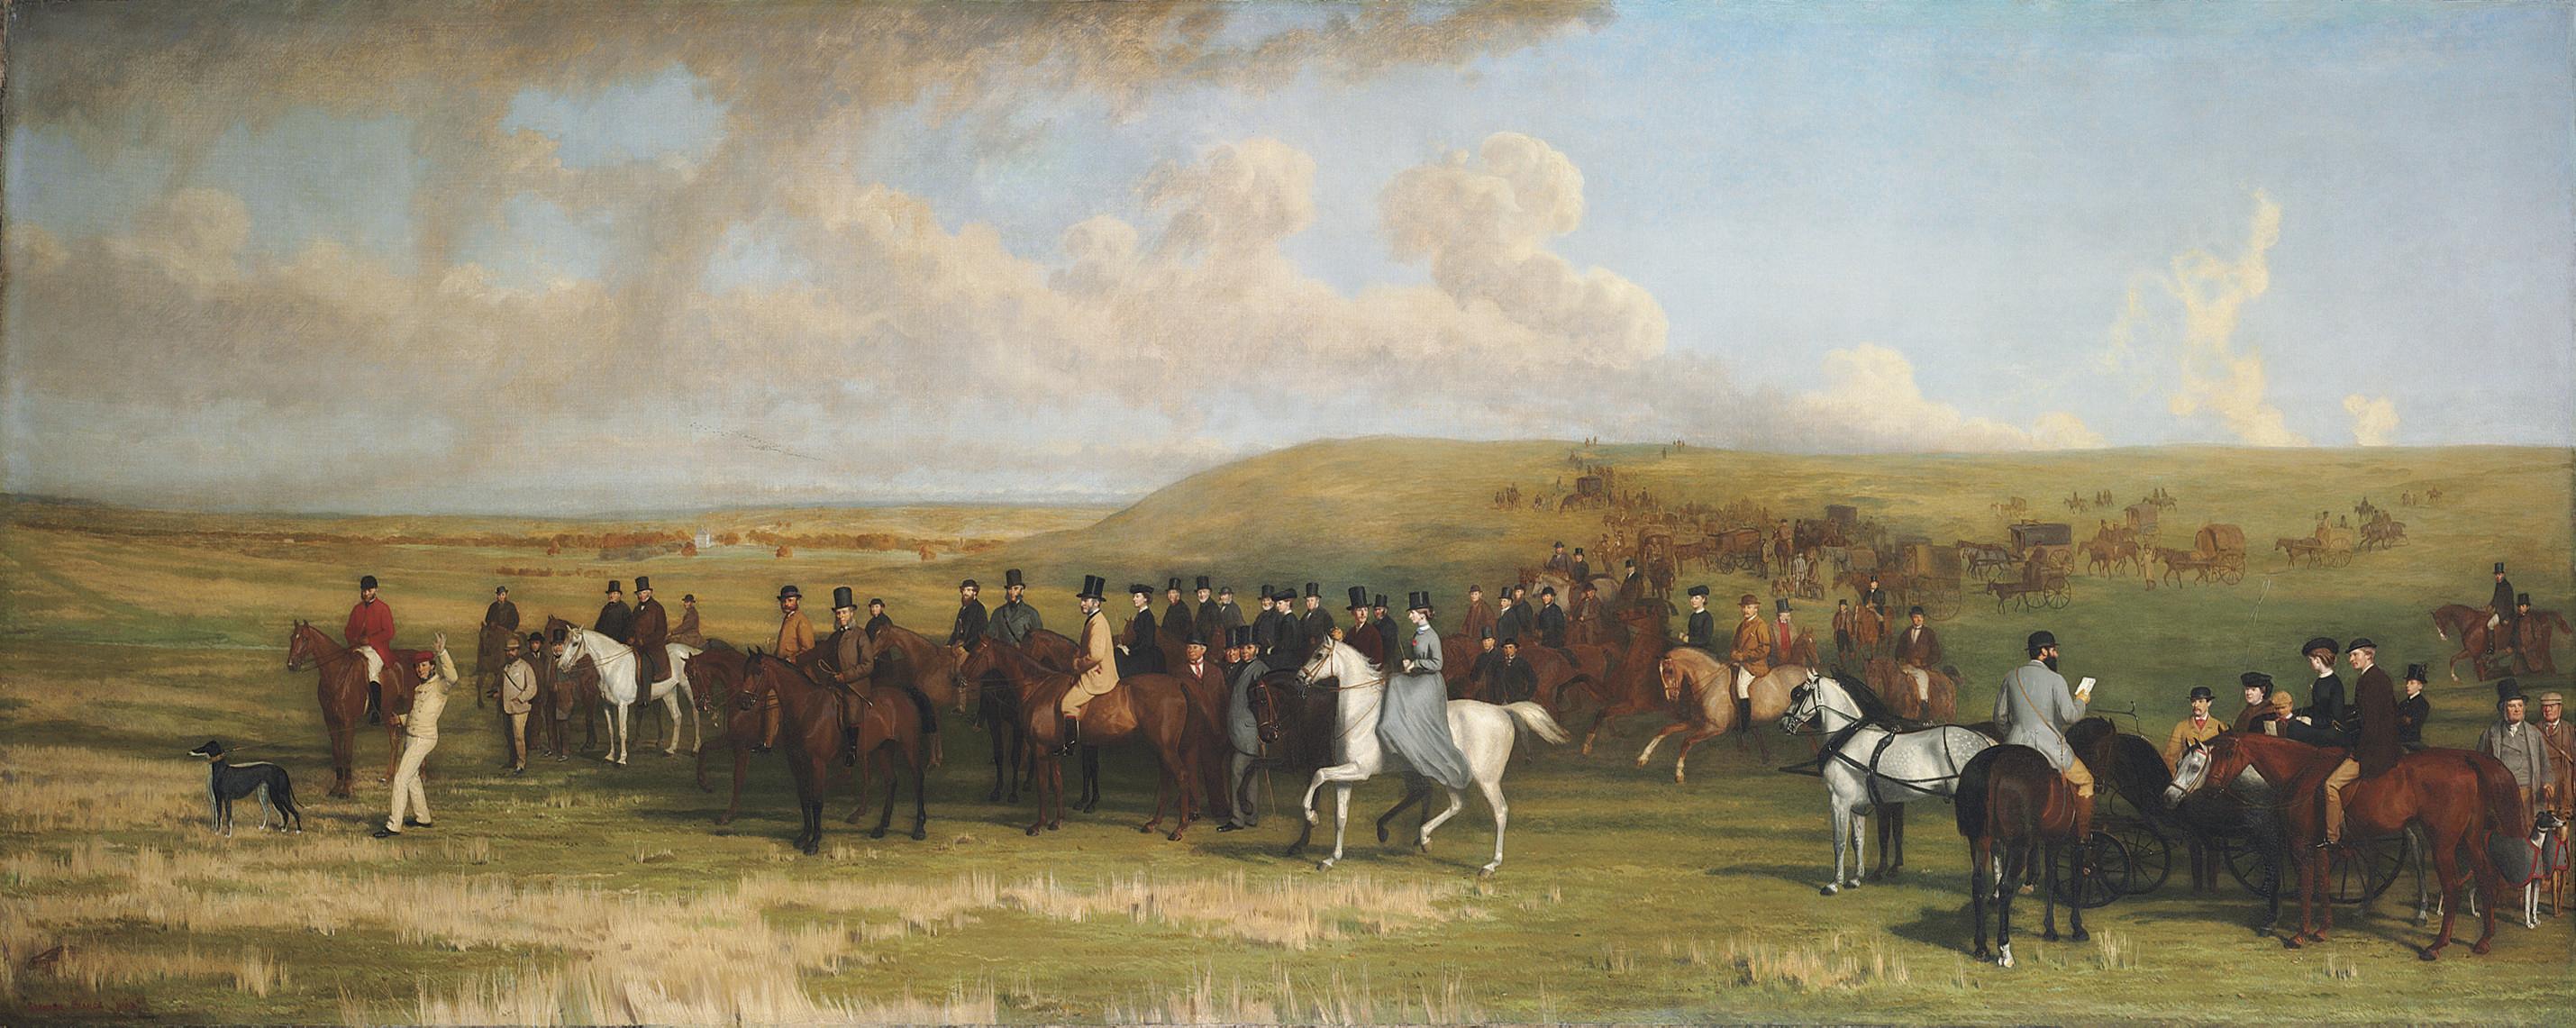 Stephen Pearce (London 1819-19